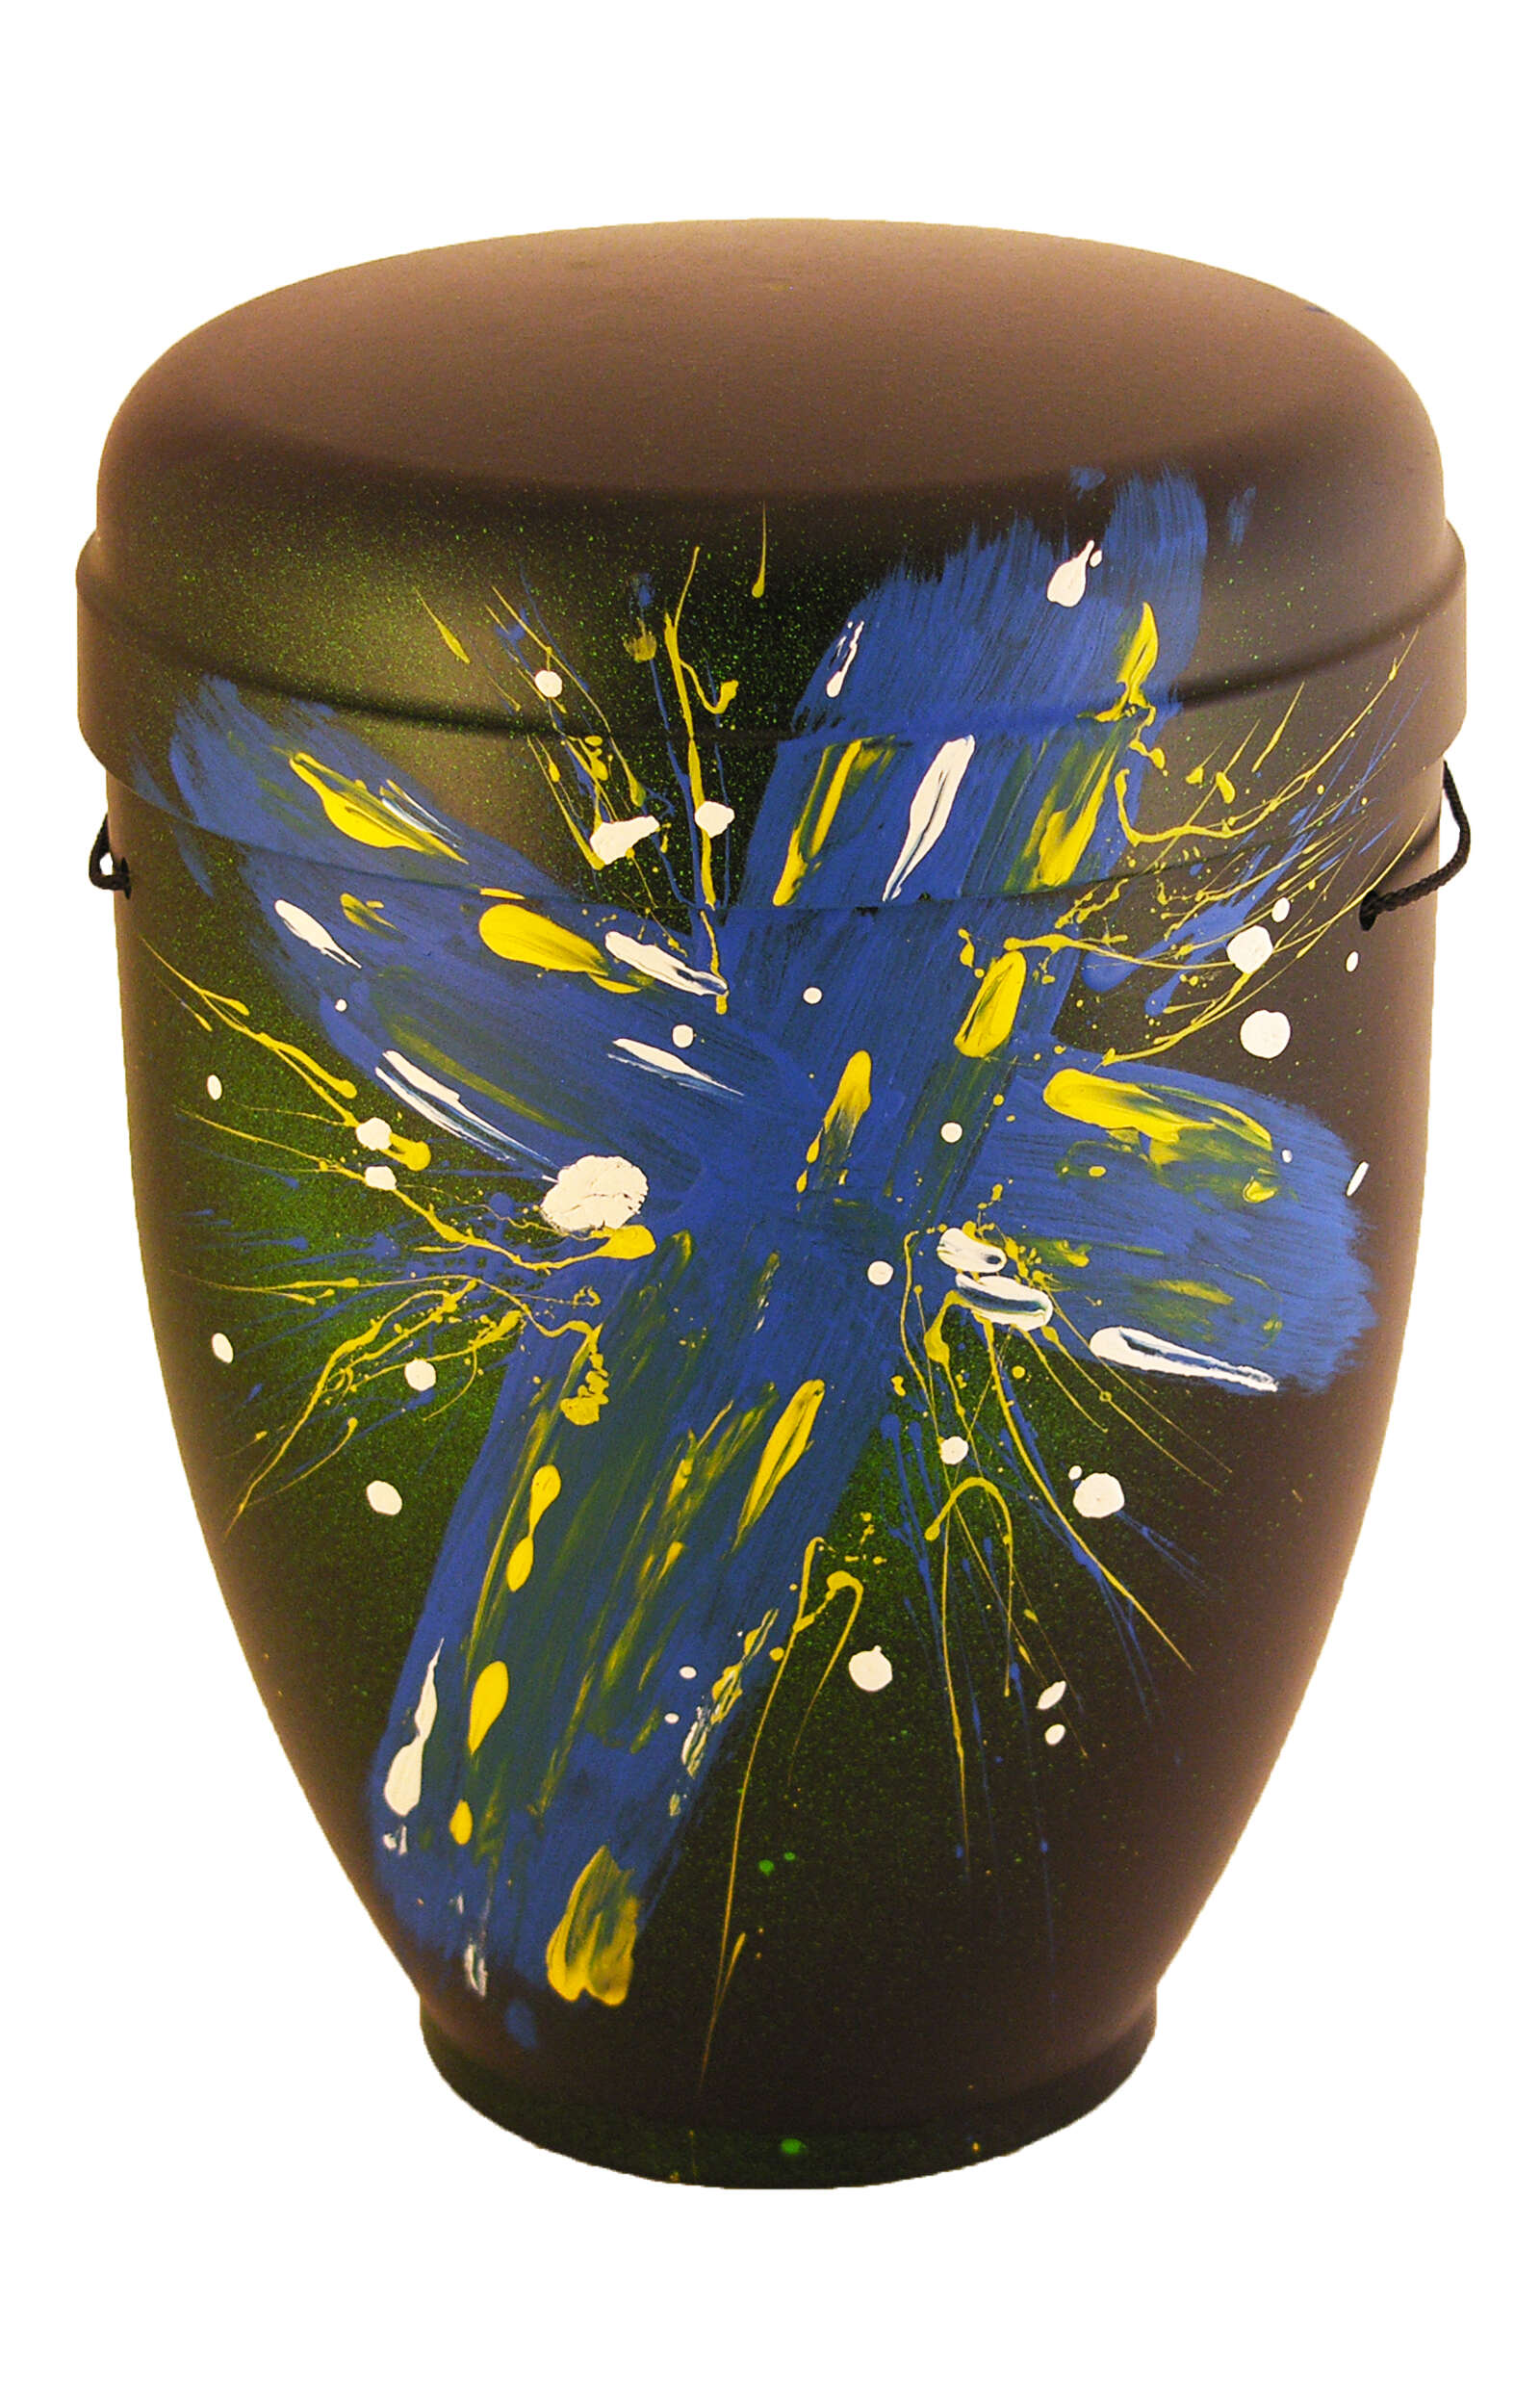 en BS3390 biodigradable urn comar funeral urns on sale holy cross blue green